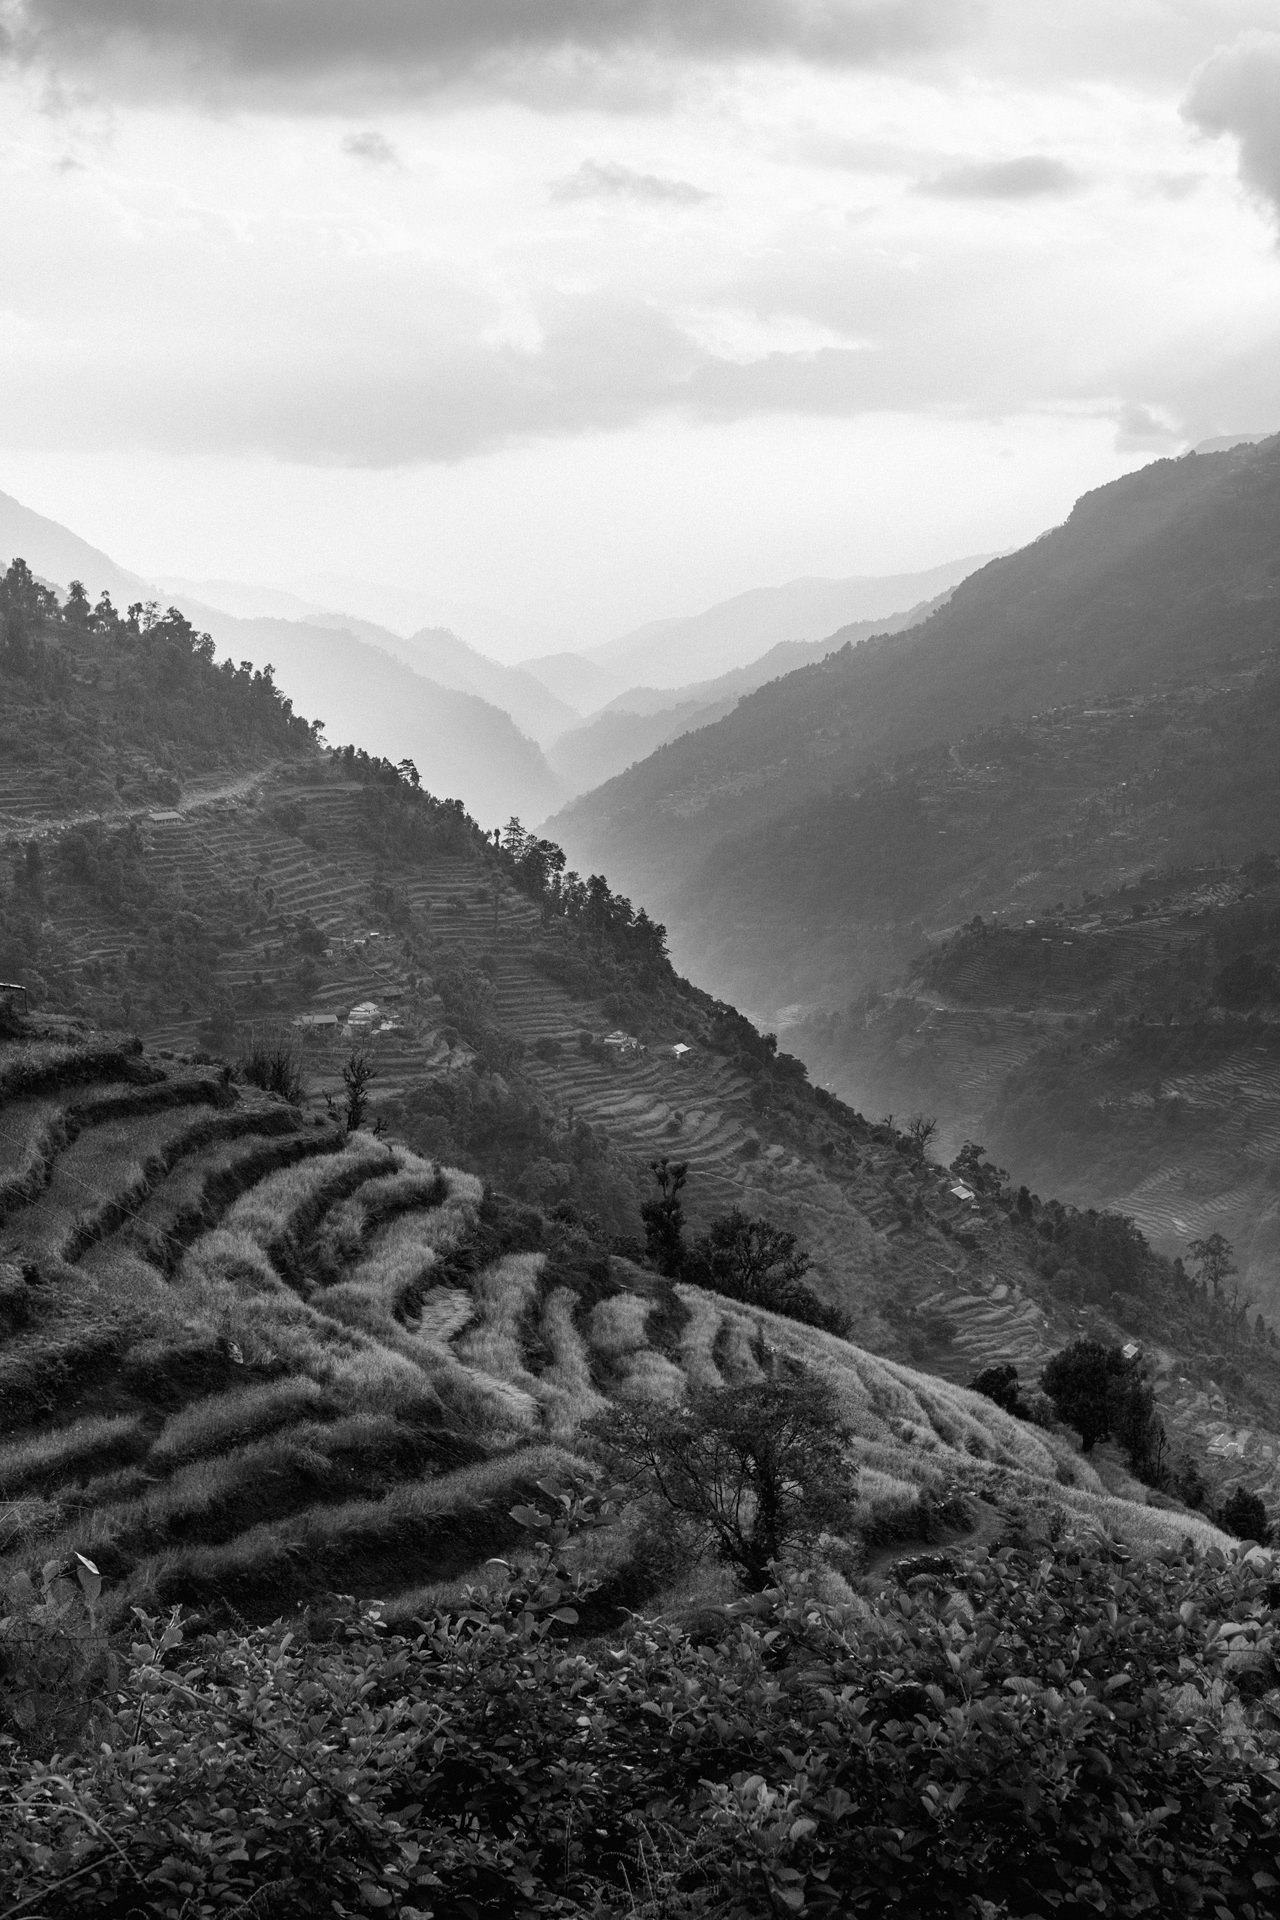 Nepal 2019 - Trekking Annapurna Base Camp 69